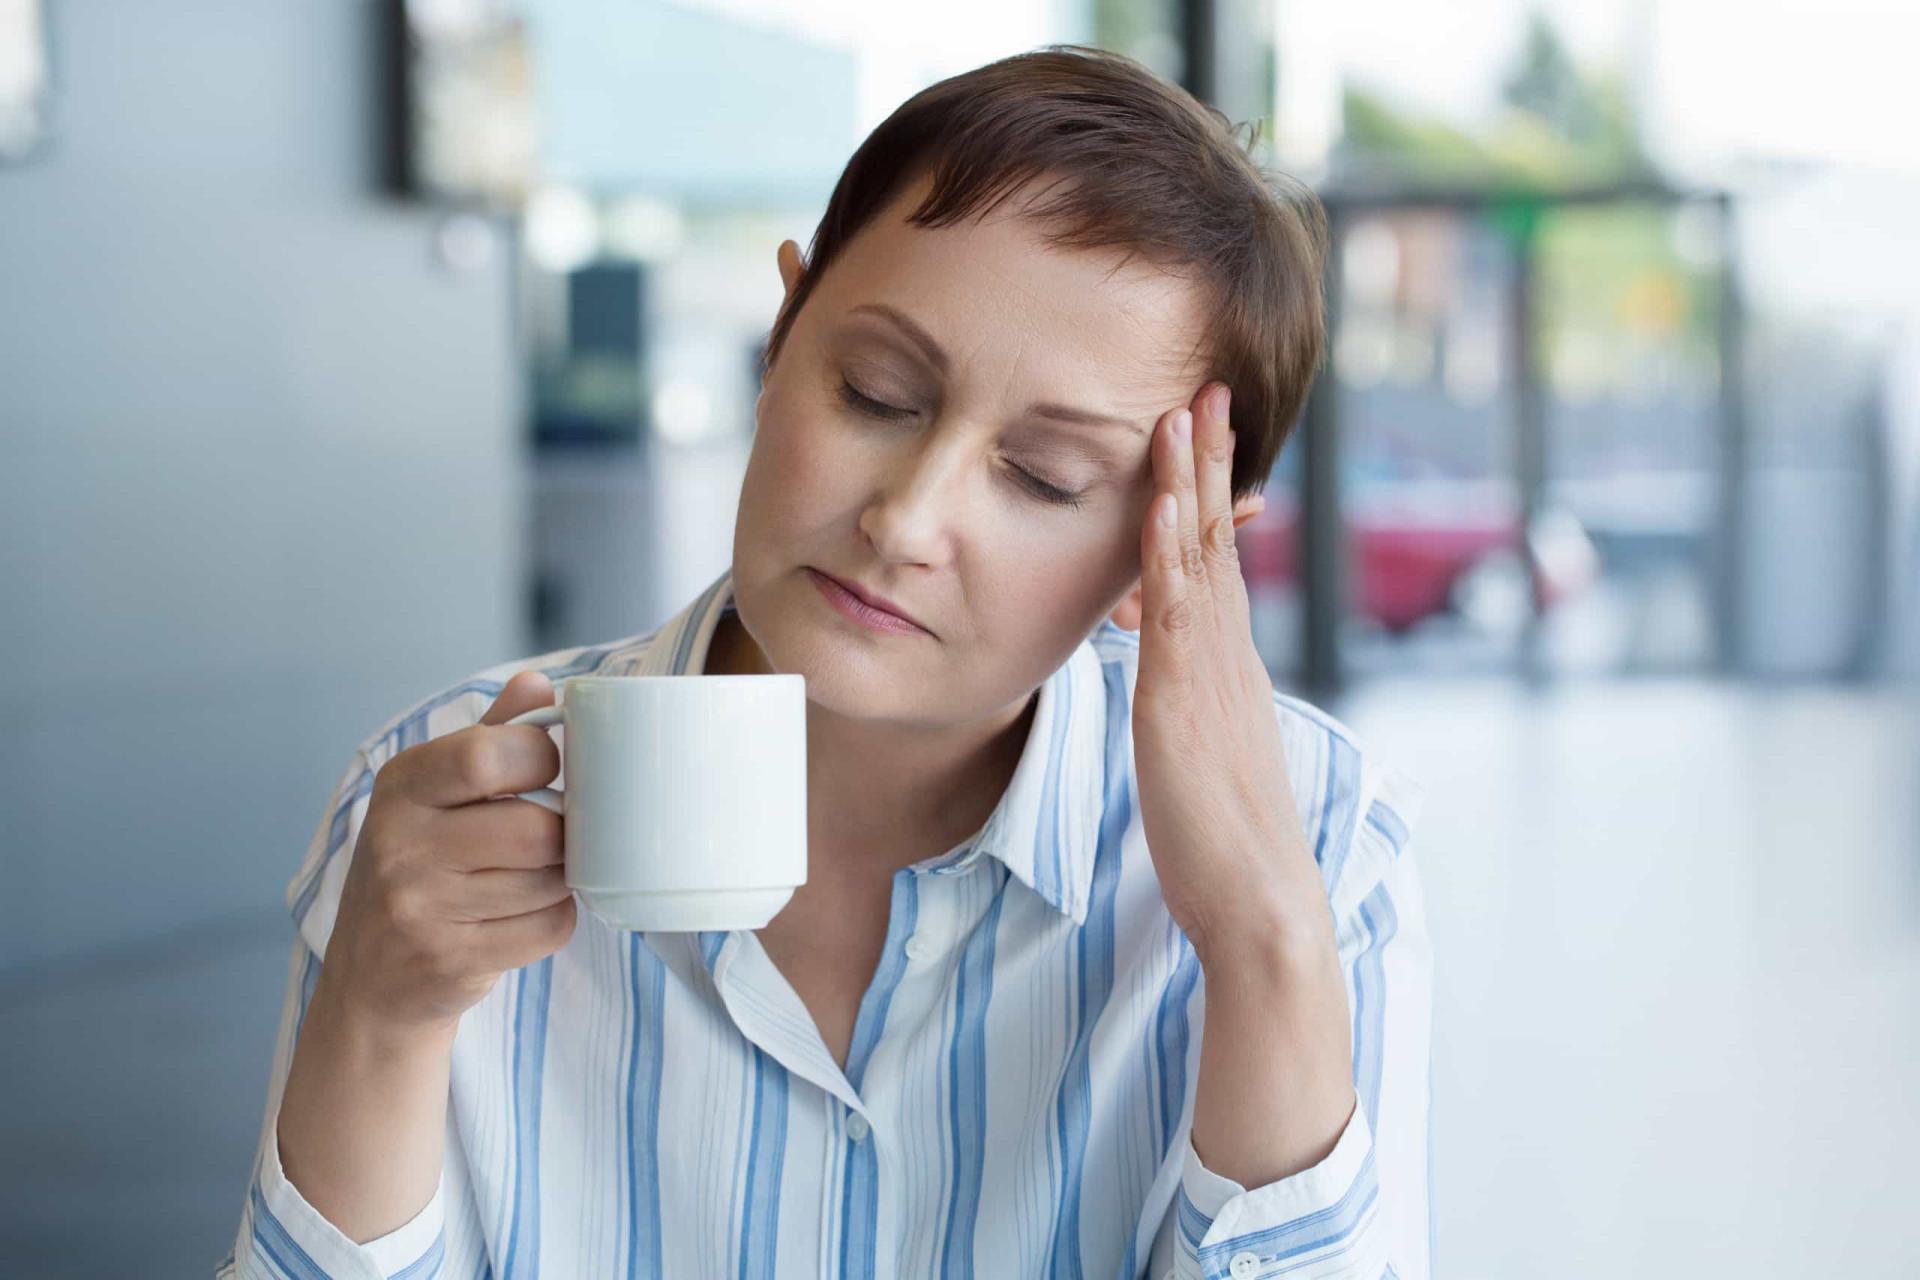 Cafeína, cafeína! Usos surpreendentes do café